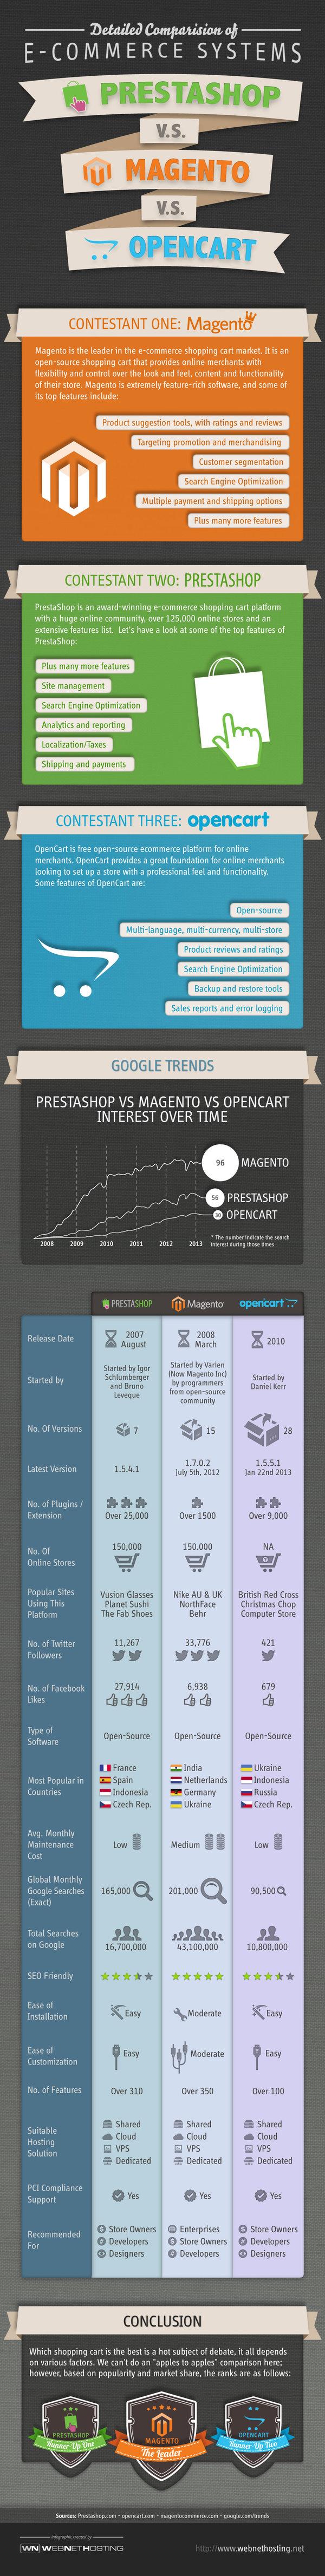 prestashop-vs-magento-vs-opencart-infographic